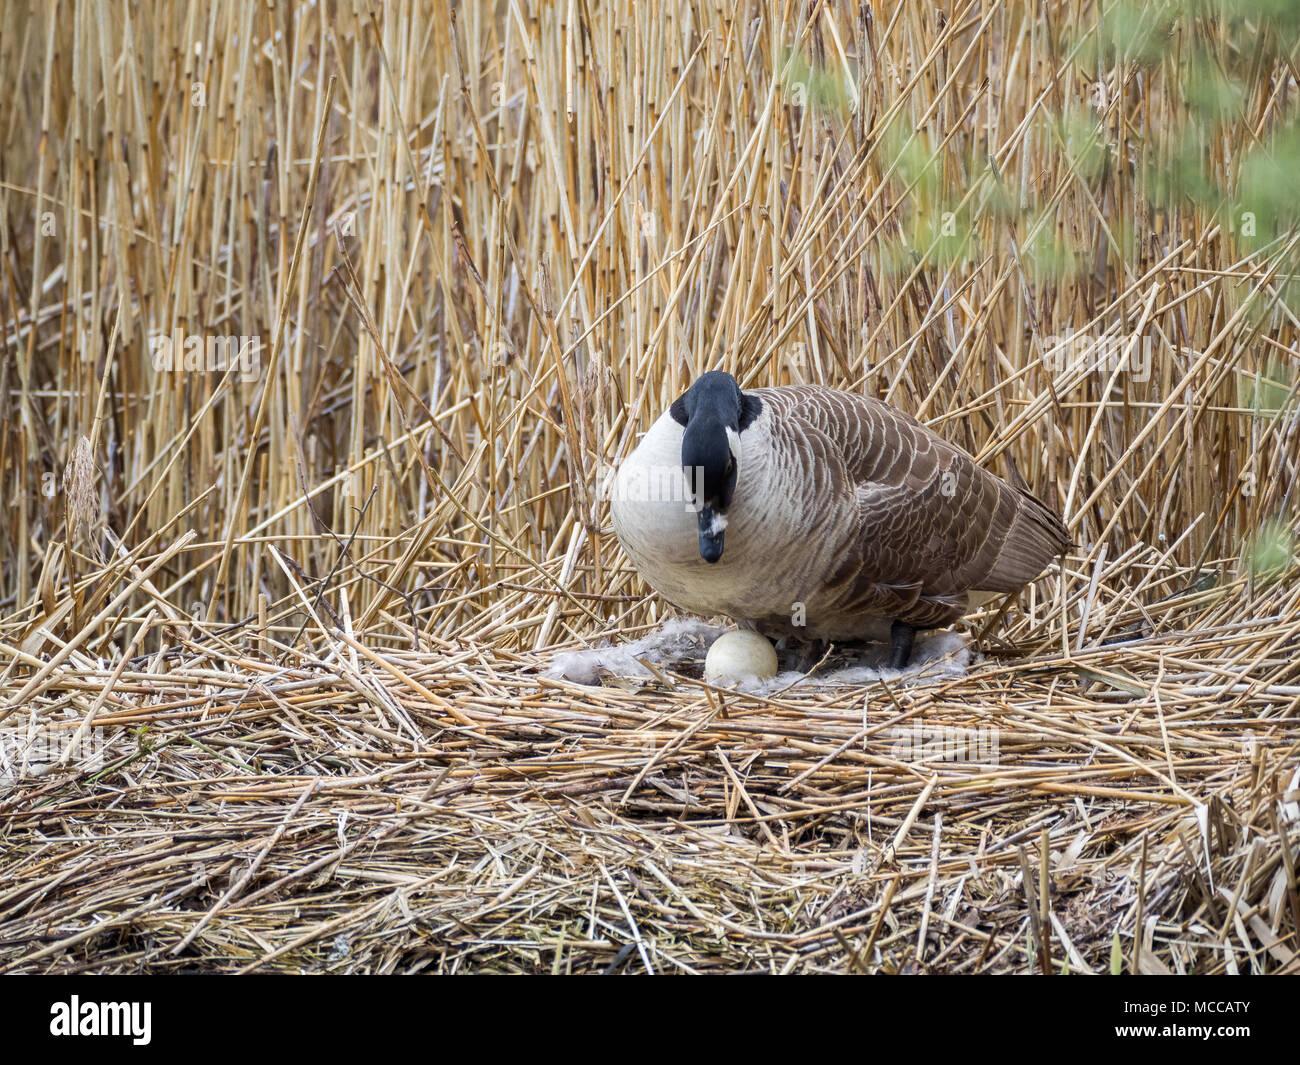 Nesting Canada Goose, Teifi Marshes, Wales Stock Photo